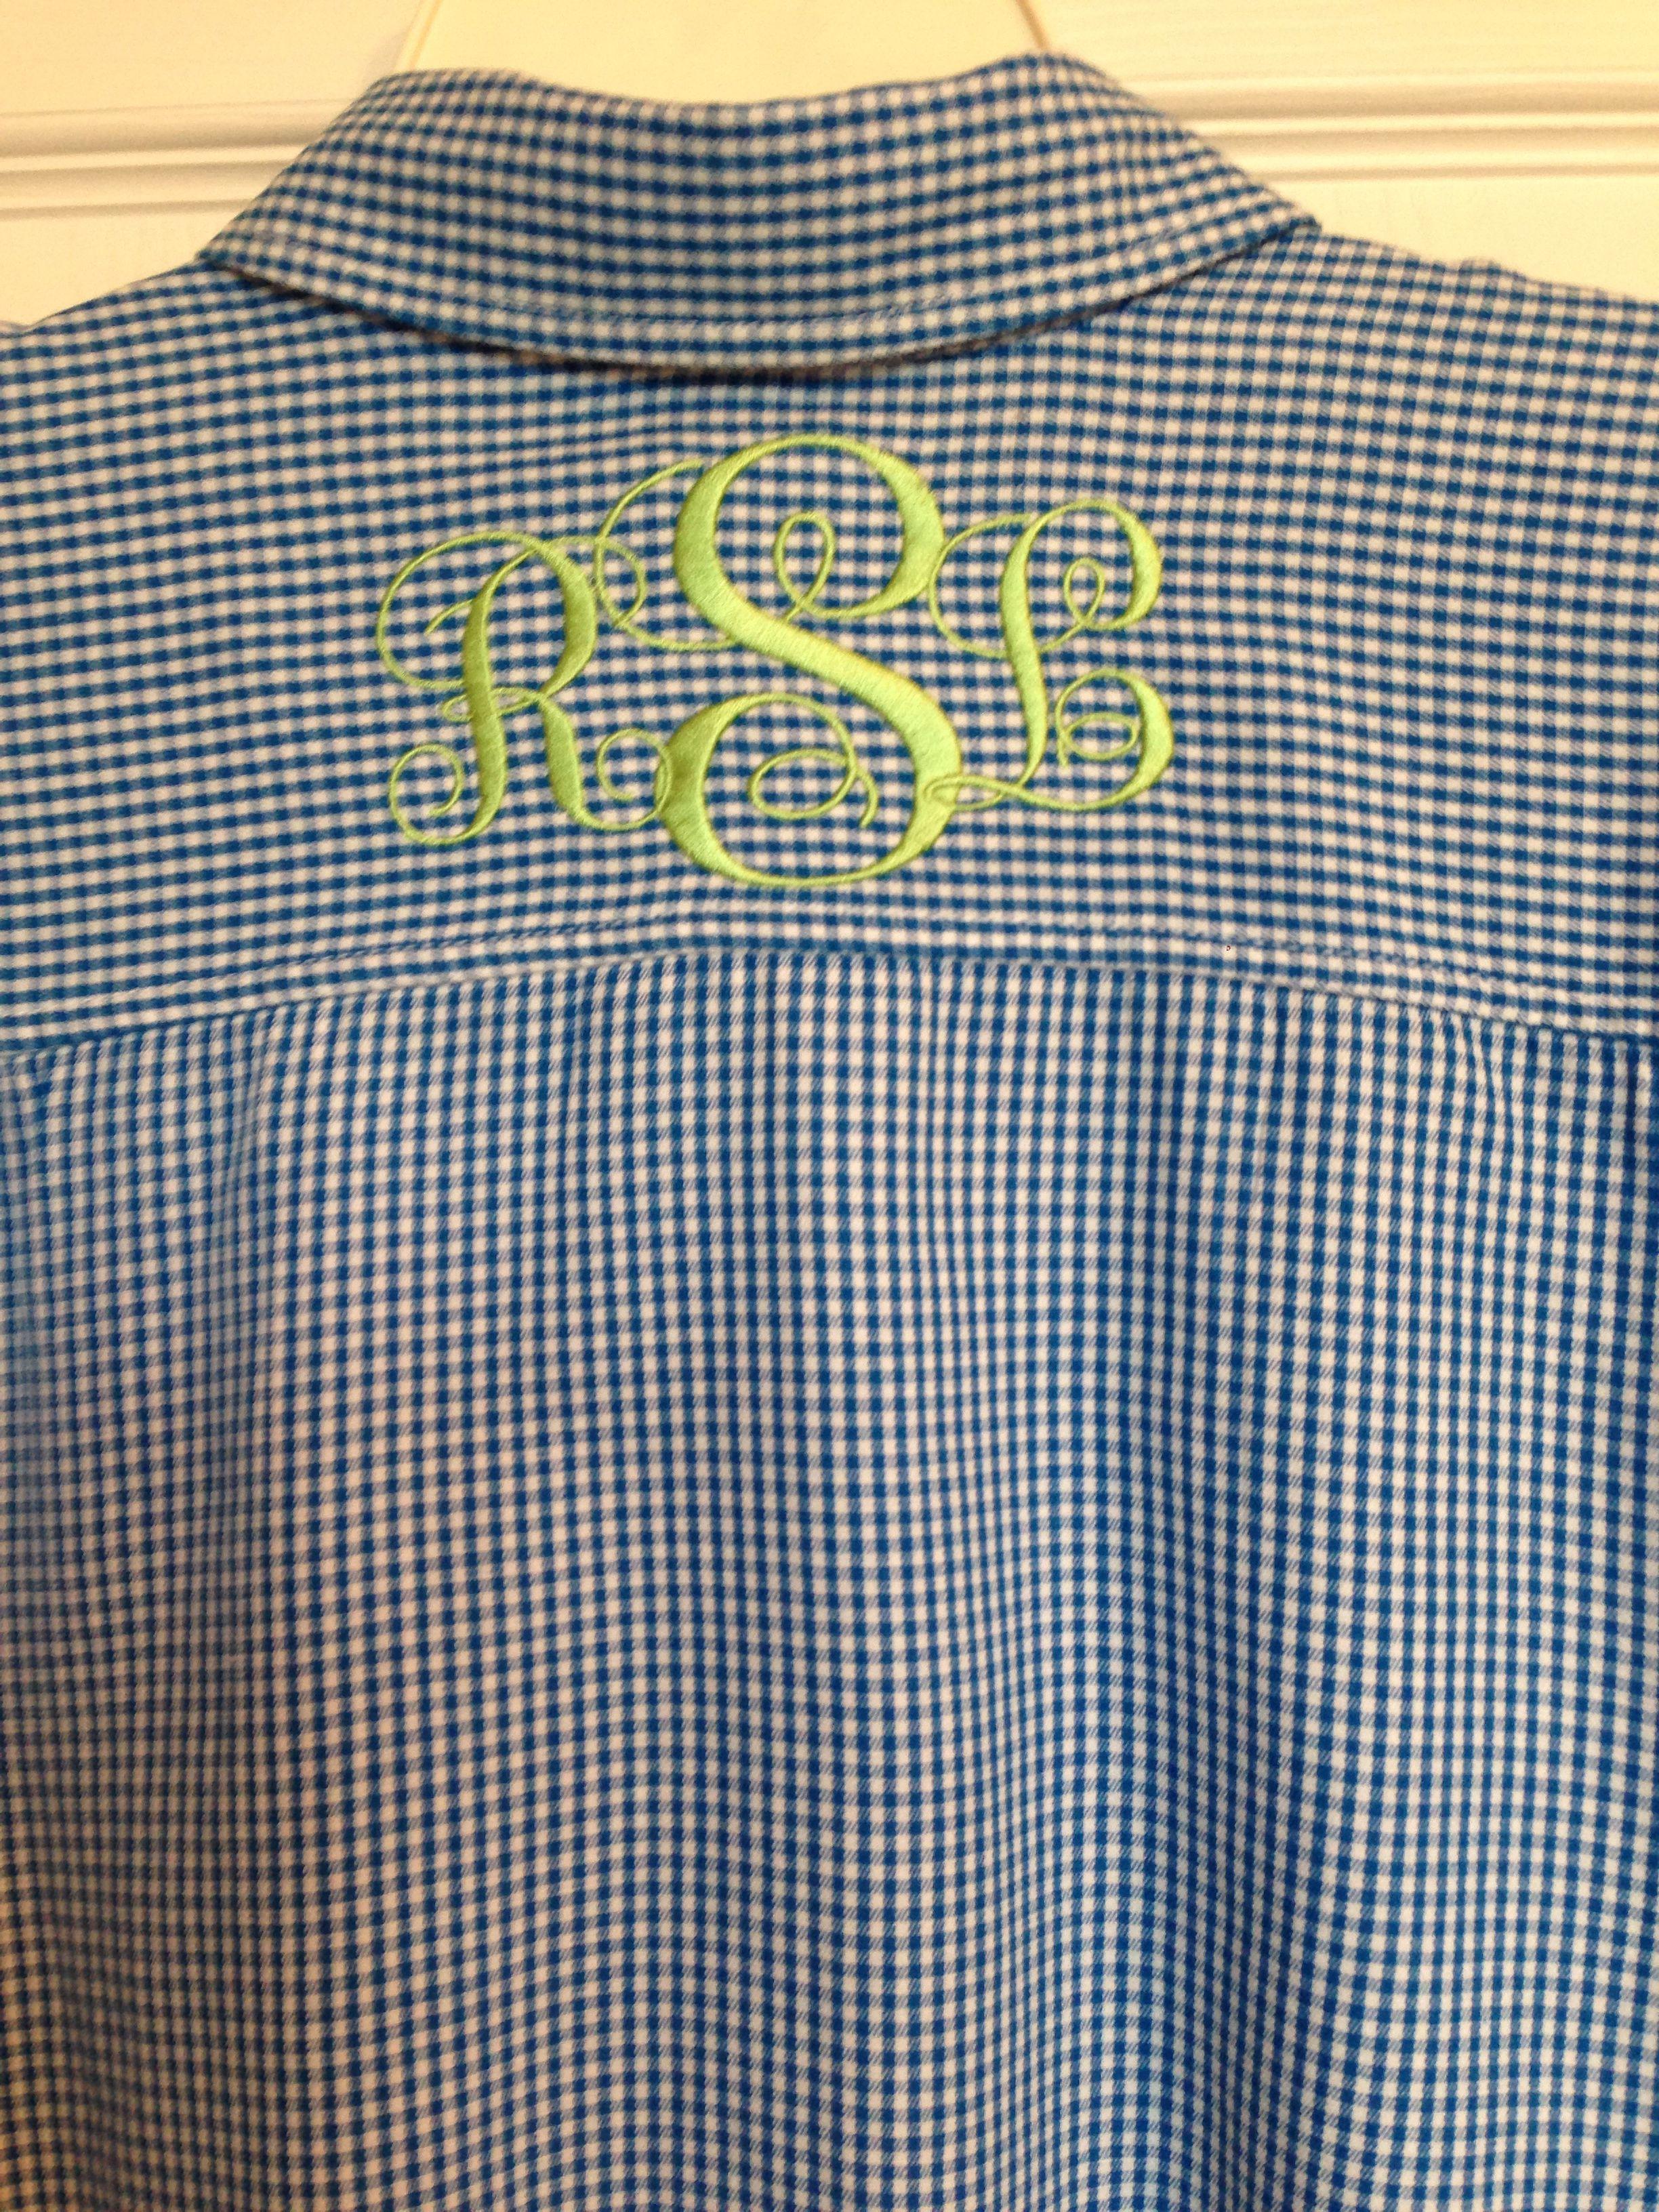 Monogram yoke on back of shirt machine embroidery patterns ღ